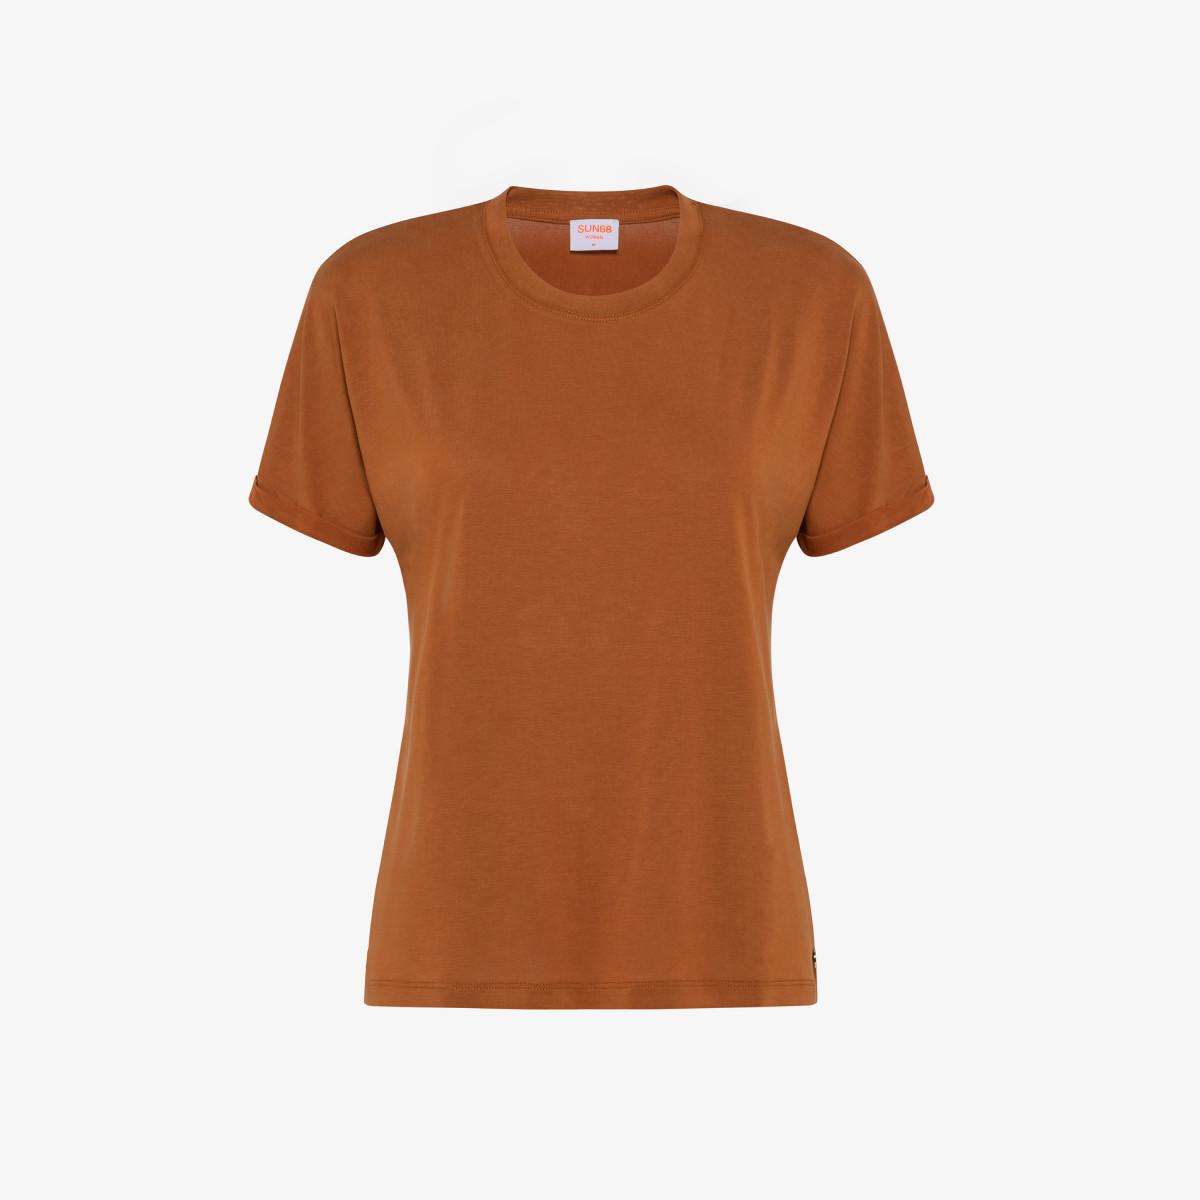 ROUND NECK T-SHIRT SHINY S/S SAND